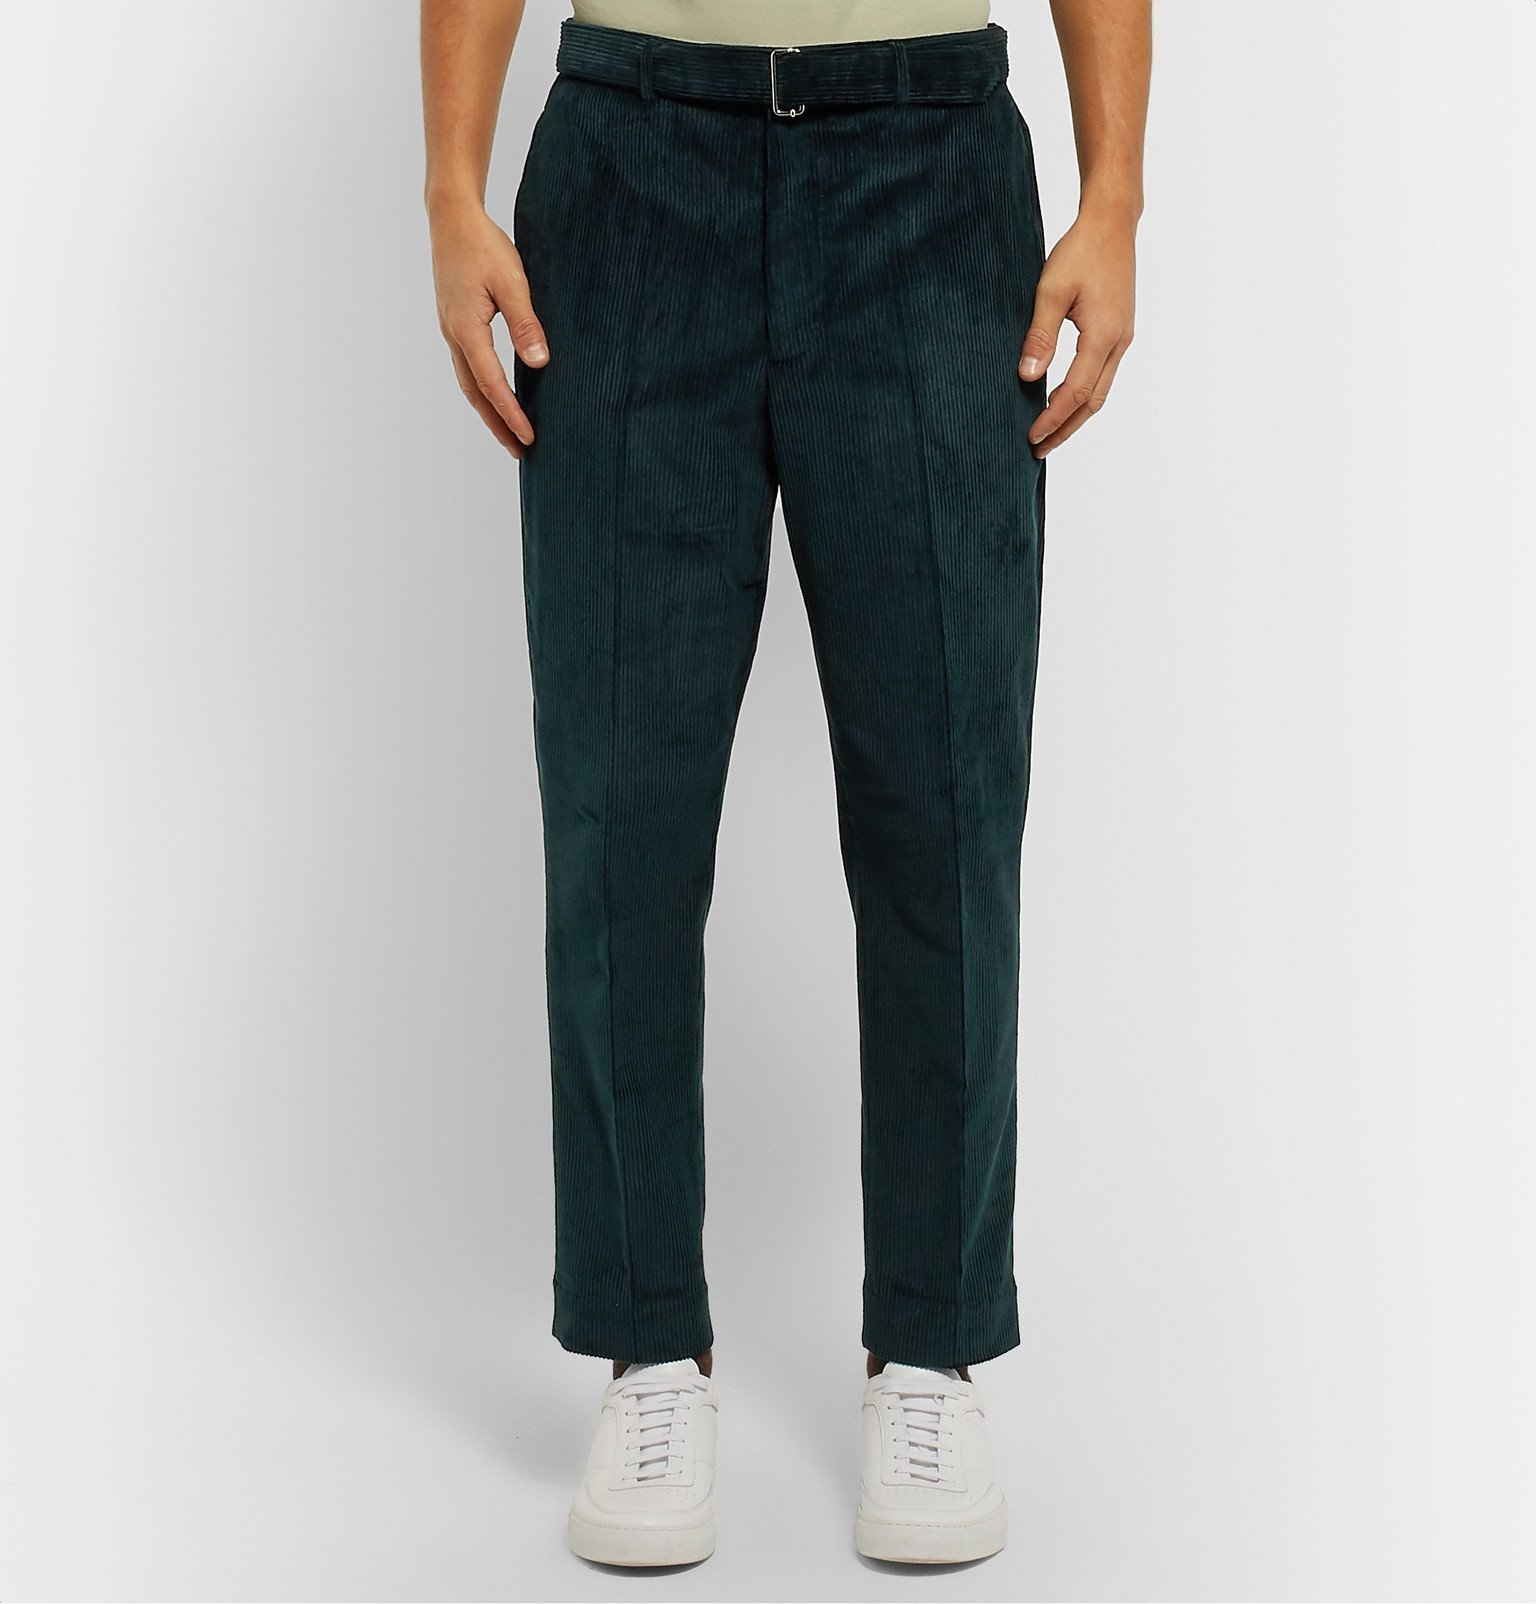 Officine Generale - Dark-Green Owen Tapered Cotton-Corduroy Suit Trousers - Green